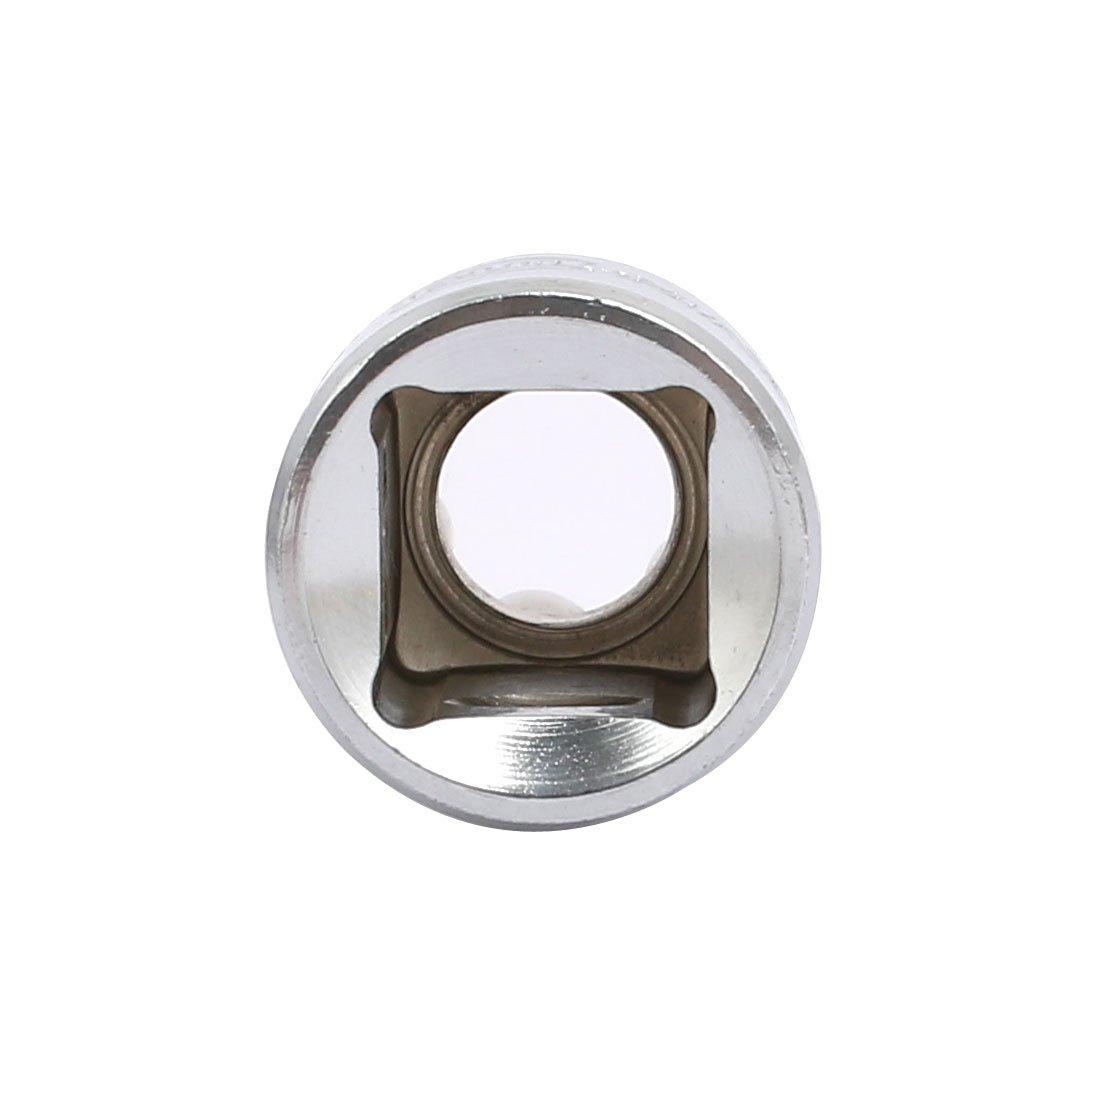 Aexit E16 1//2-inch Hand Operated Tools Square Drive Chrome Vanadium Steel Torx Impact Socket 2pcs Model:70as587qo767